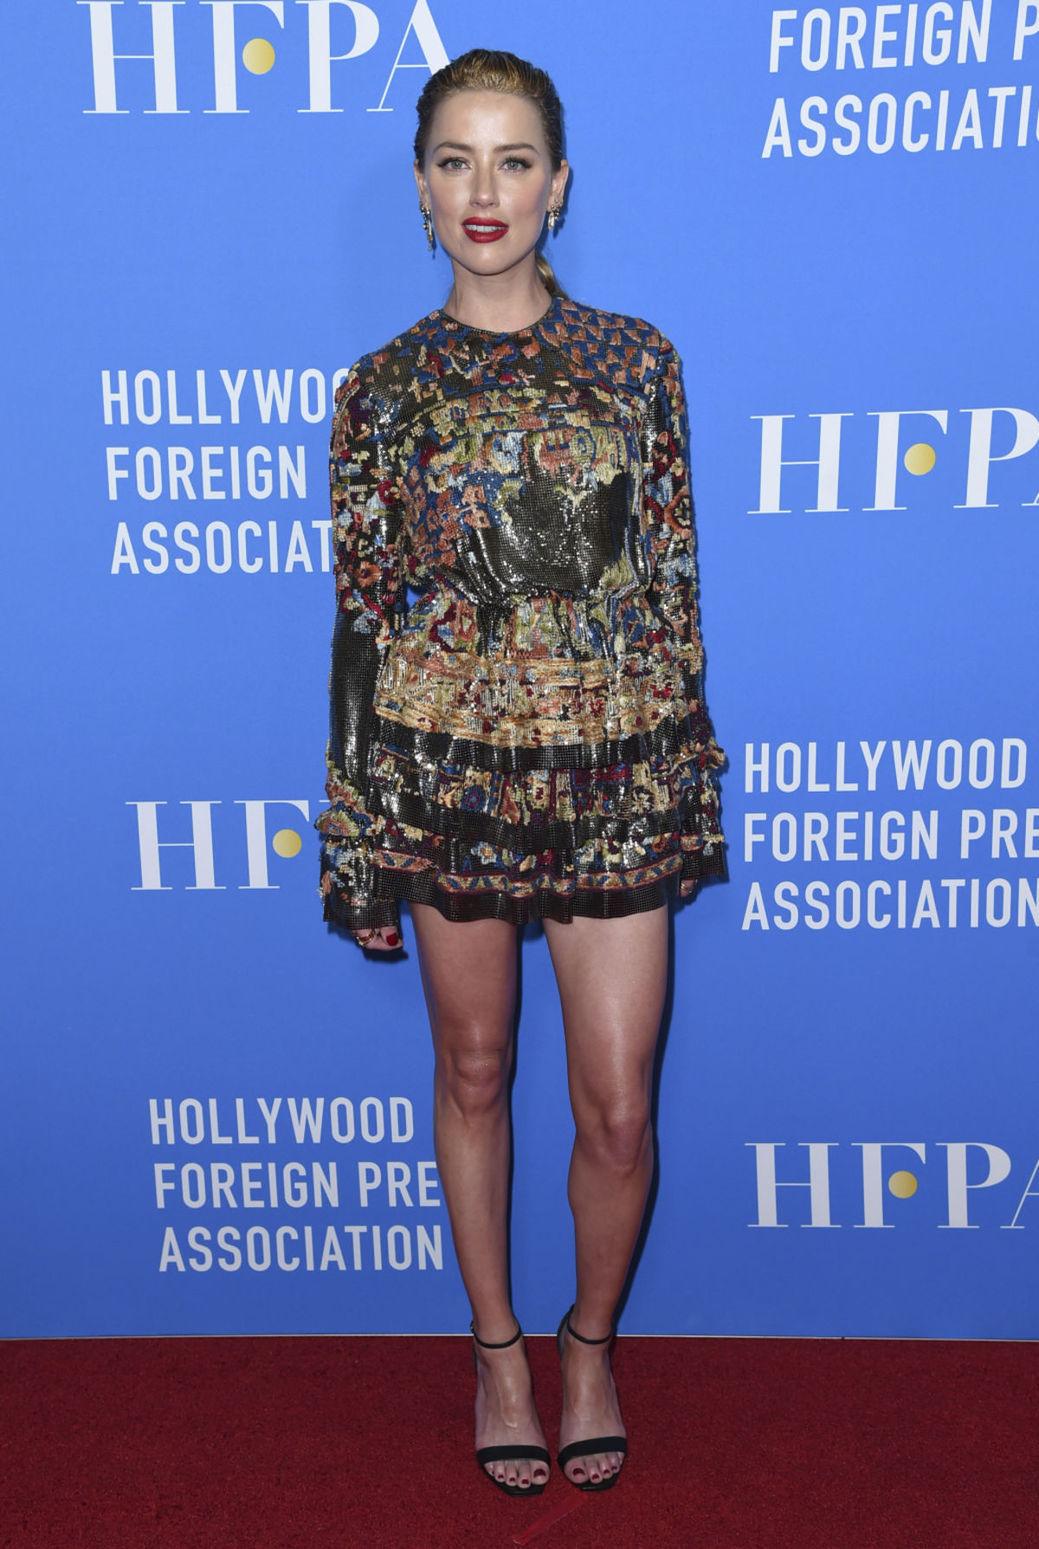 Herečka Amber Heard na akcii Hollywood Foreign...